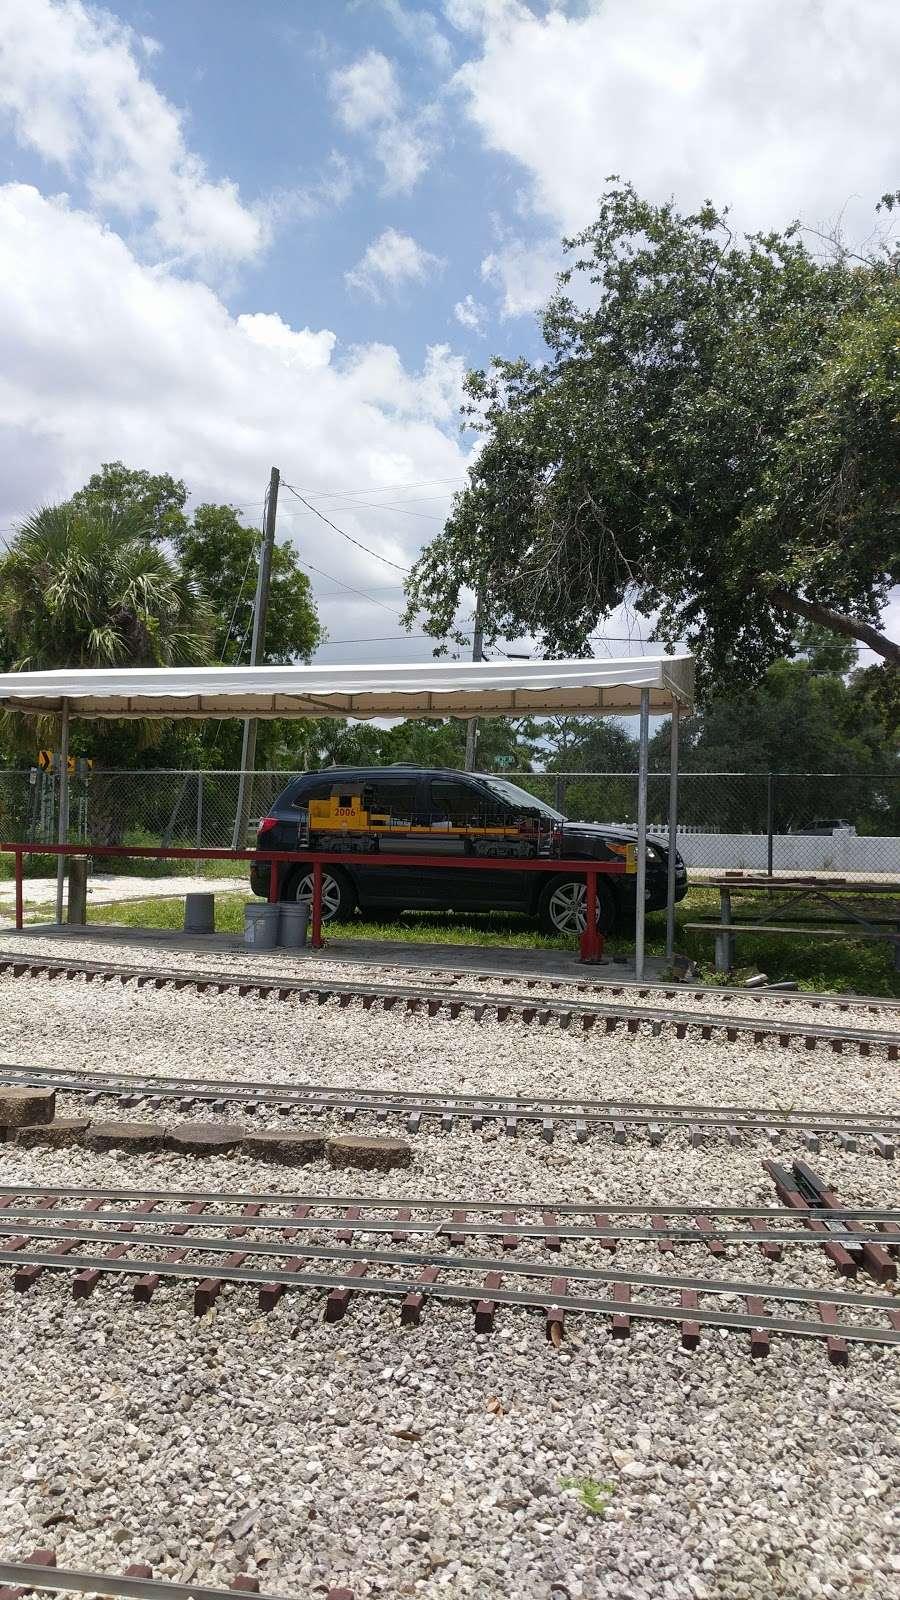 Tradewinds & Atlantic Railroad - museum  | Photo 9 of 10 | Address: Coconut Creek, FL 33073, USA | Phone: (954) 494-6877